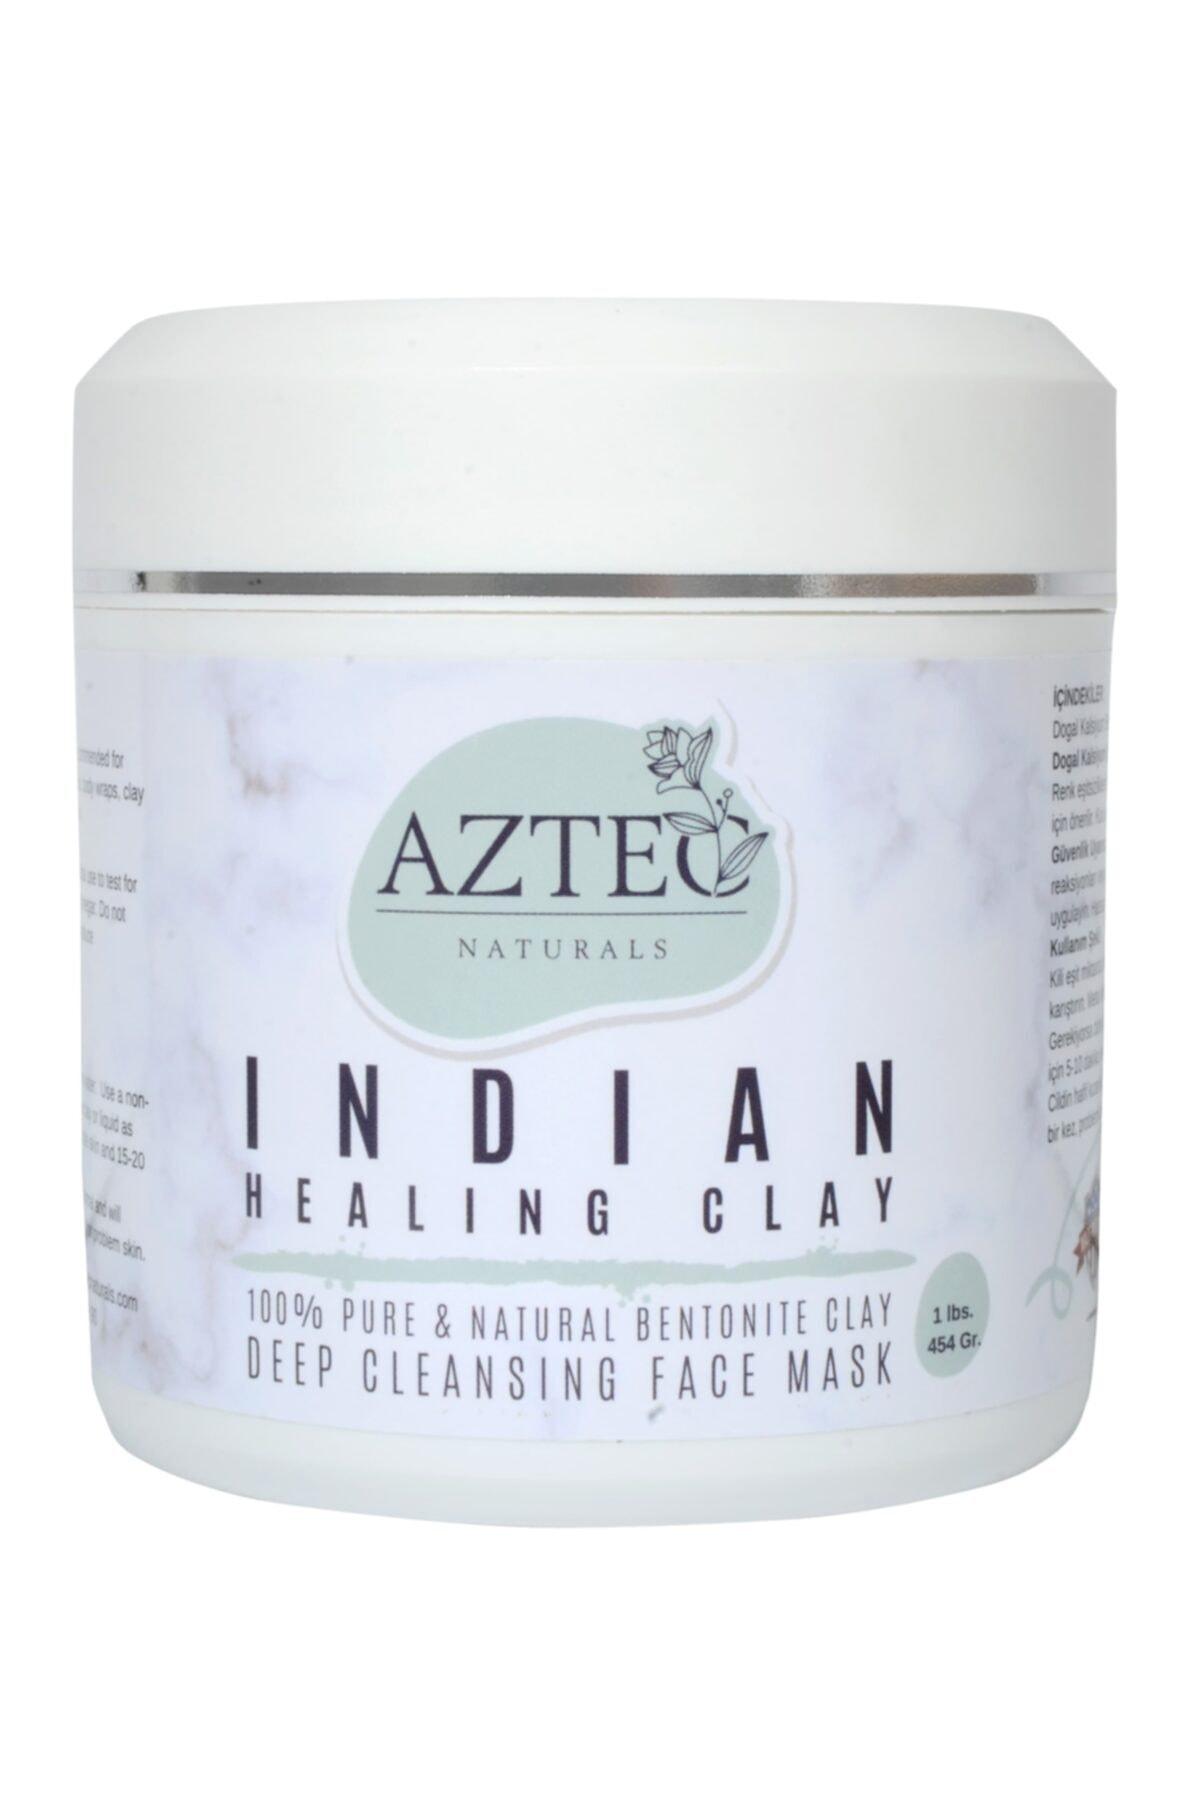 Aztec Naturals Kil Maskesi Indian Healing Clay Yüz Maskesi 454 Gr. 1